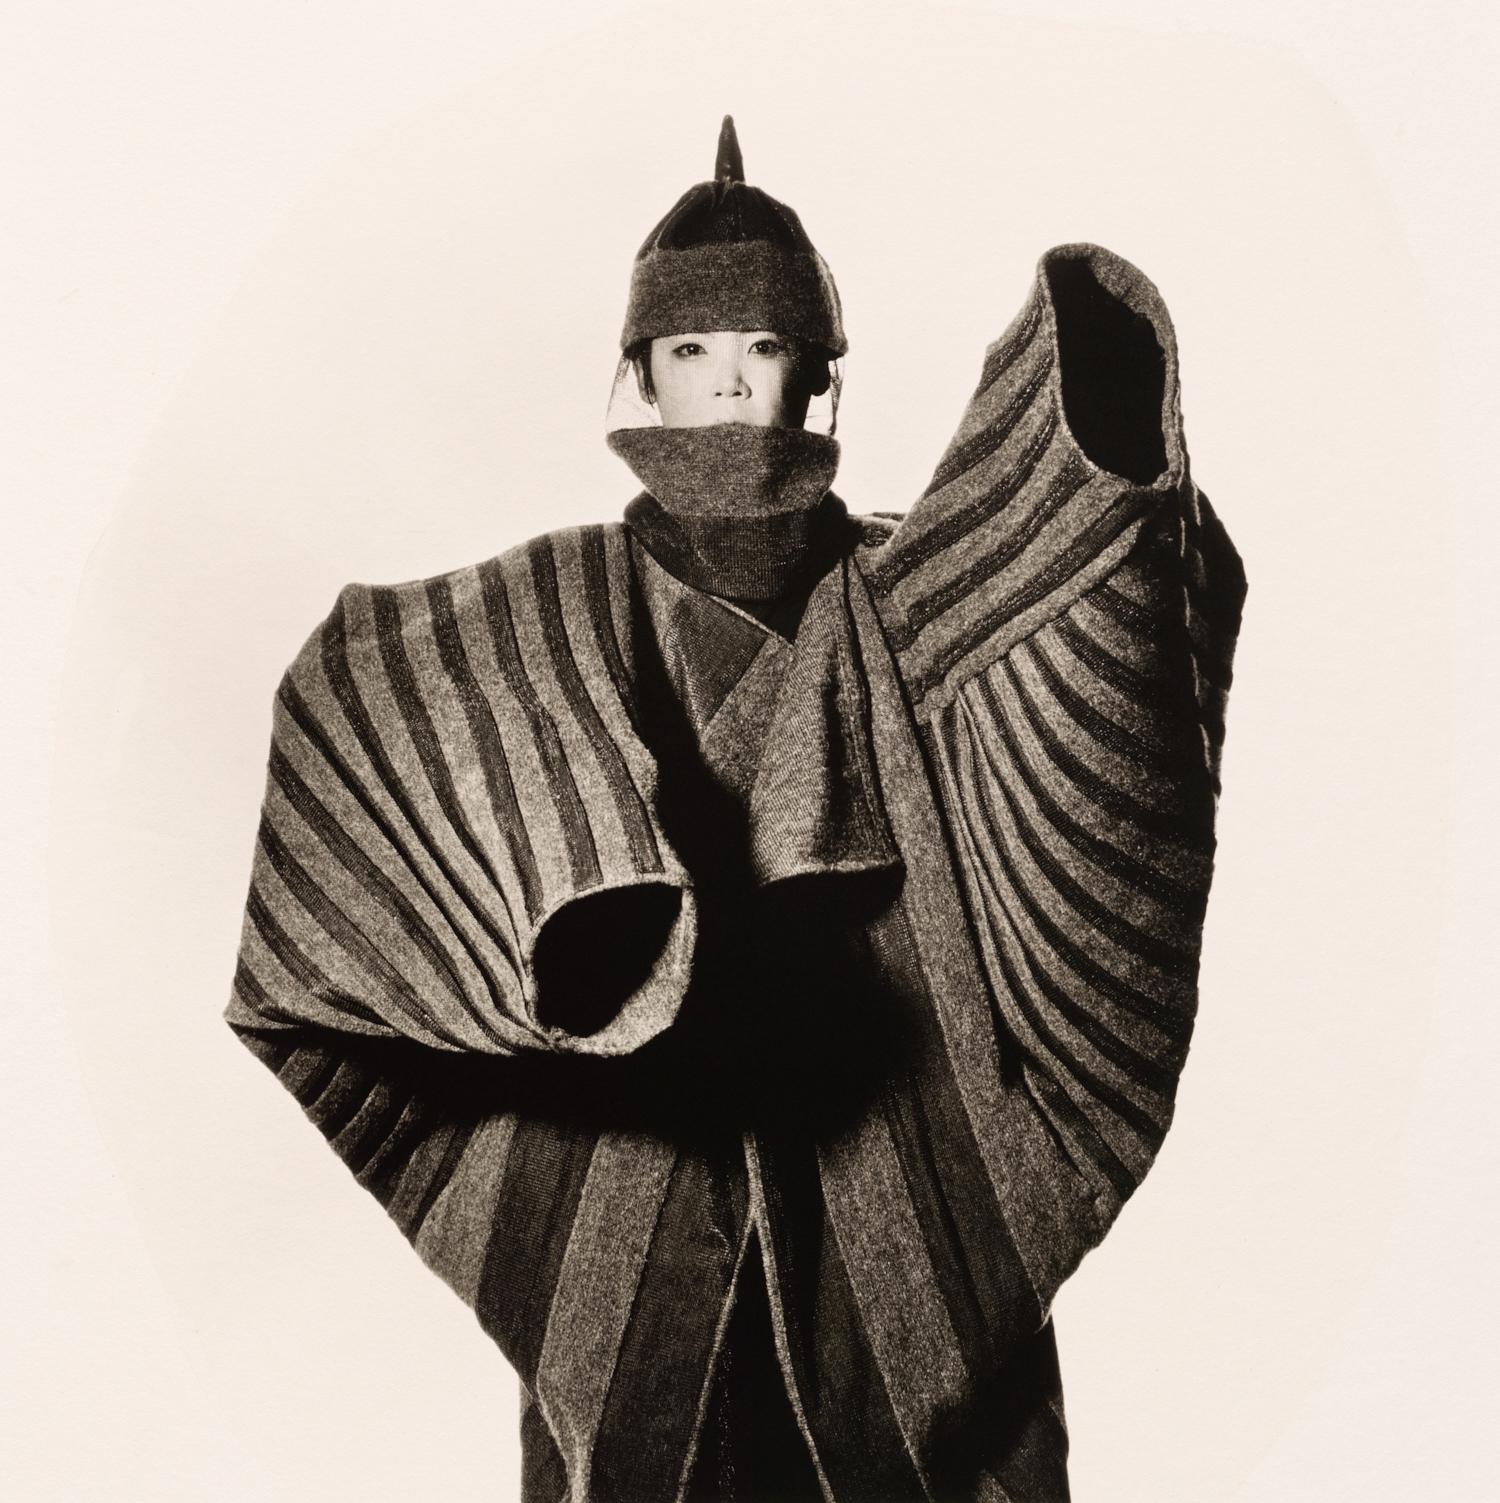 Issey Miyake Onion Flower Bud Coat , New York, 1987 Platinum-palladium print © The Irving Penn Foundation